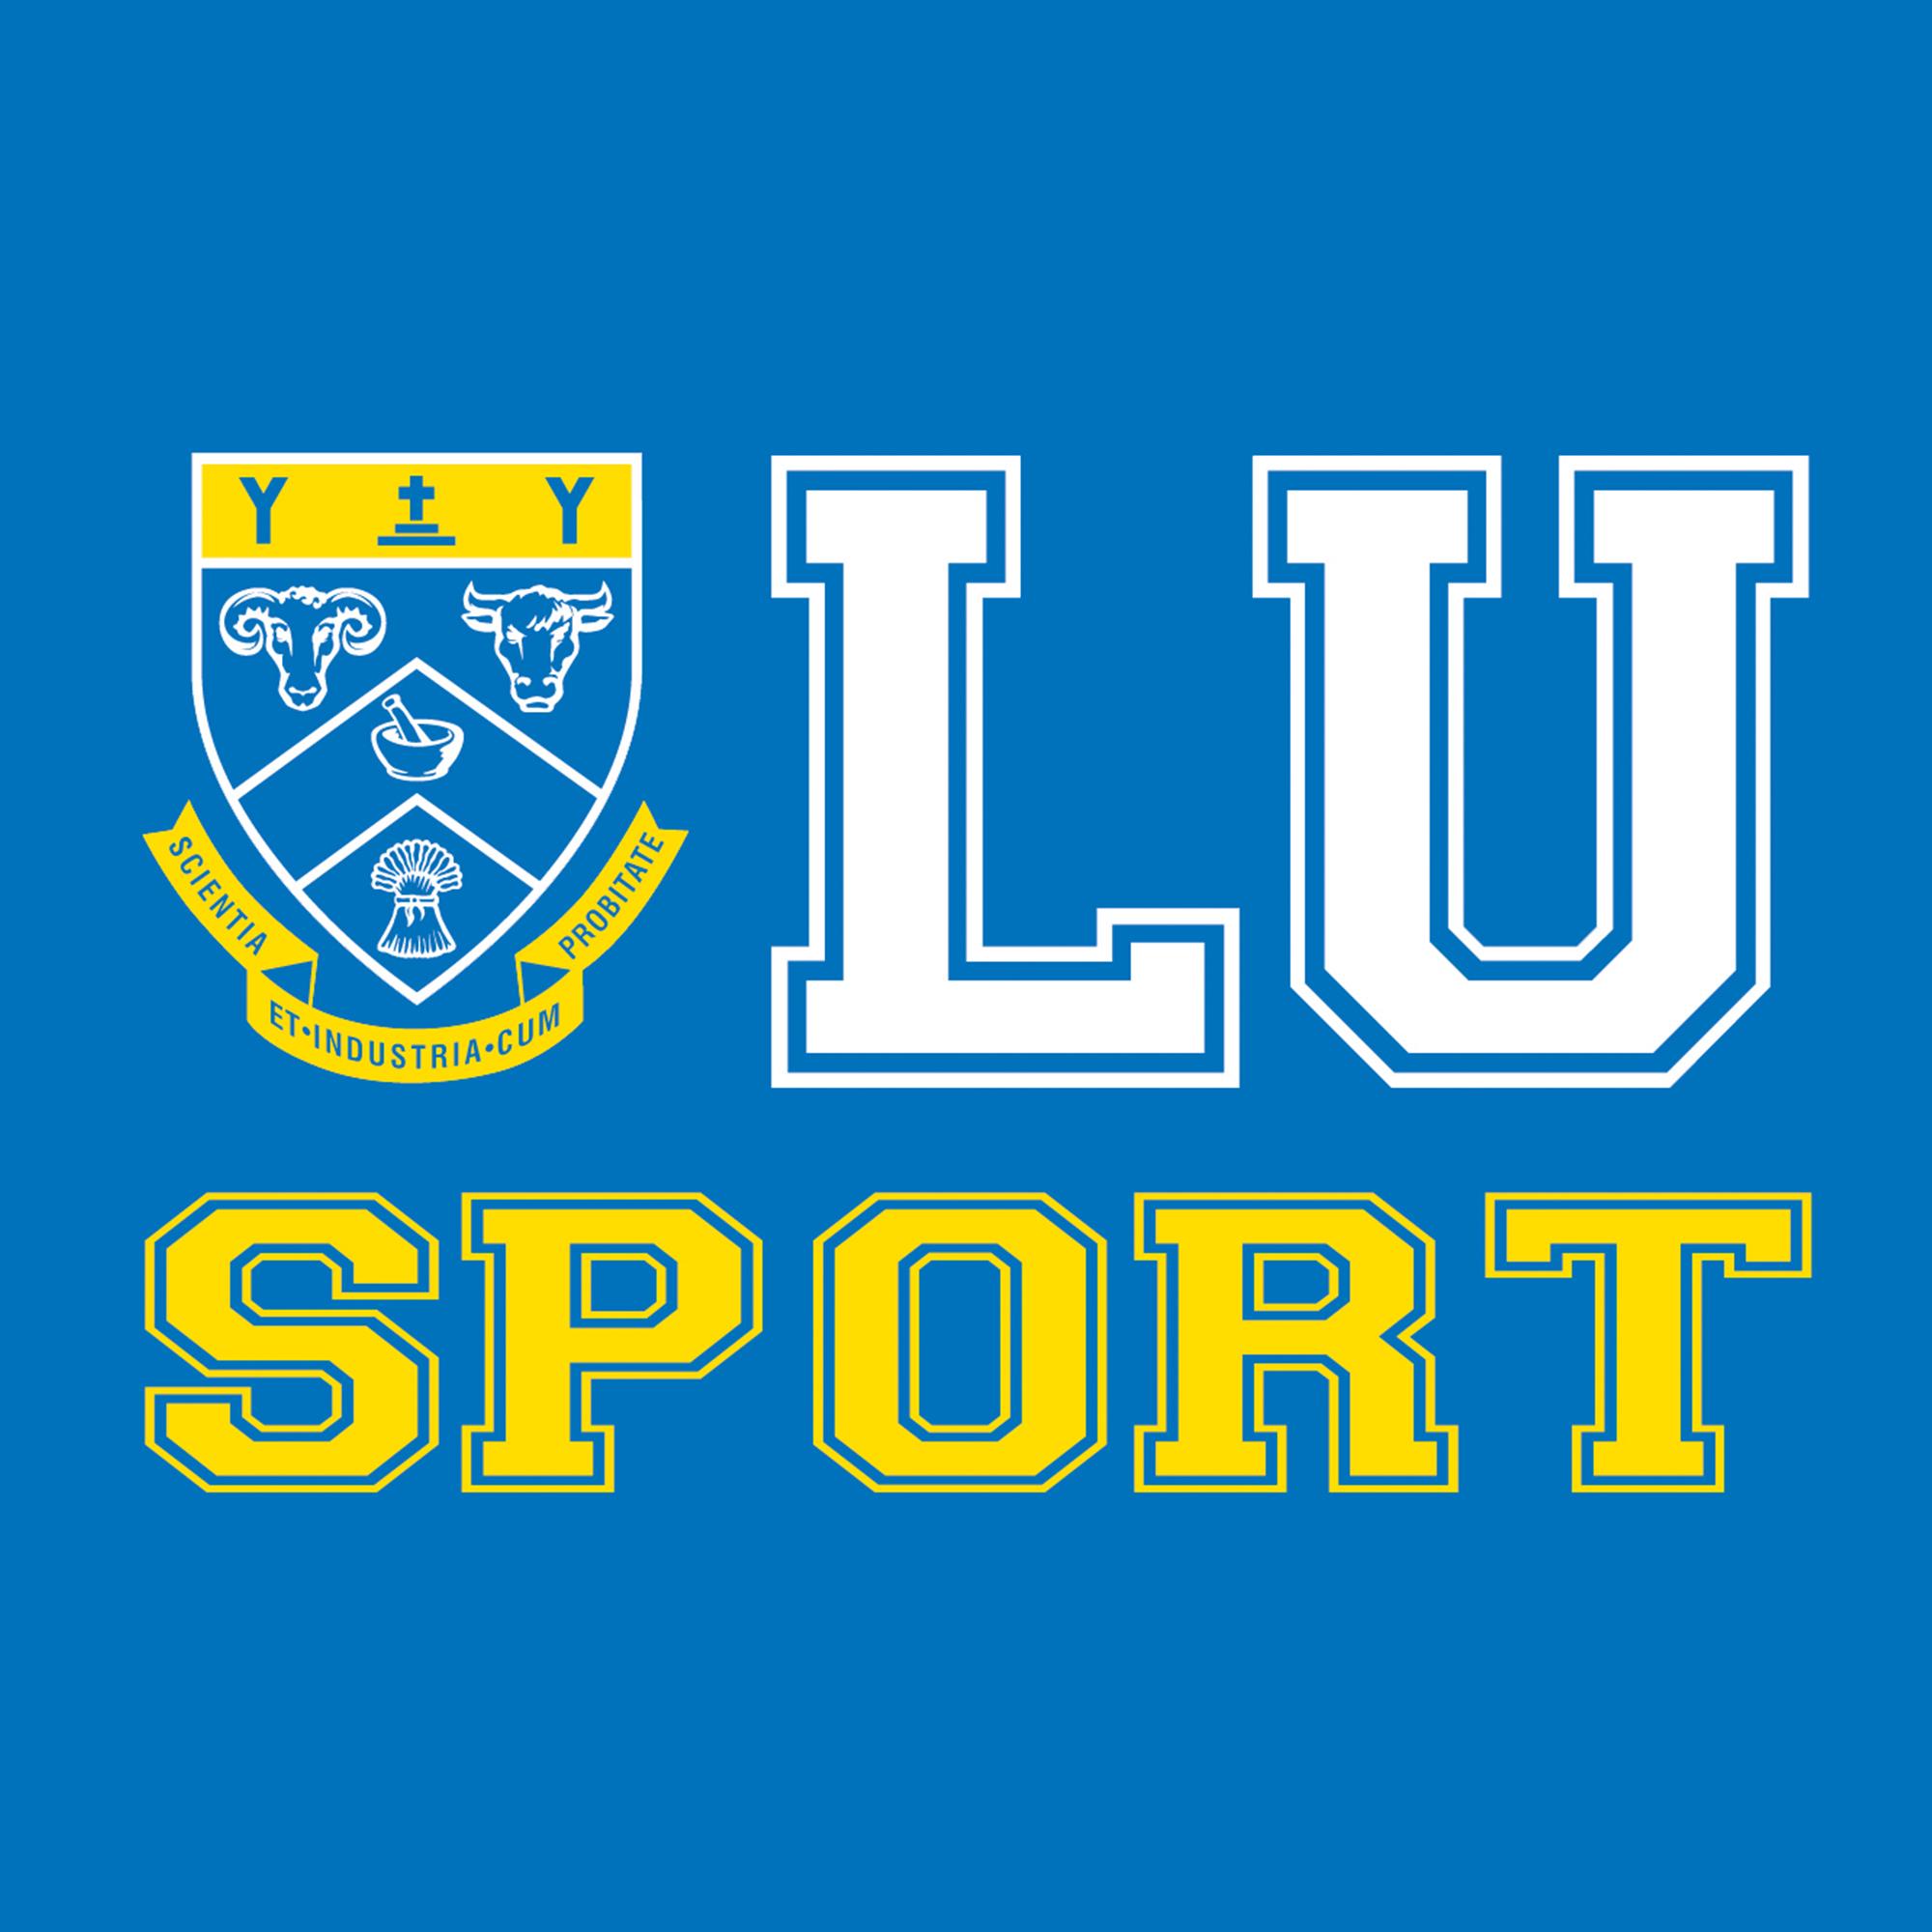 LUSport-Sporty-Sq-April-20181 logo.jpg